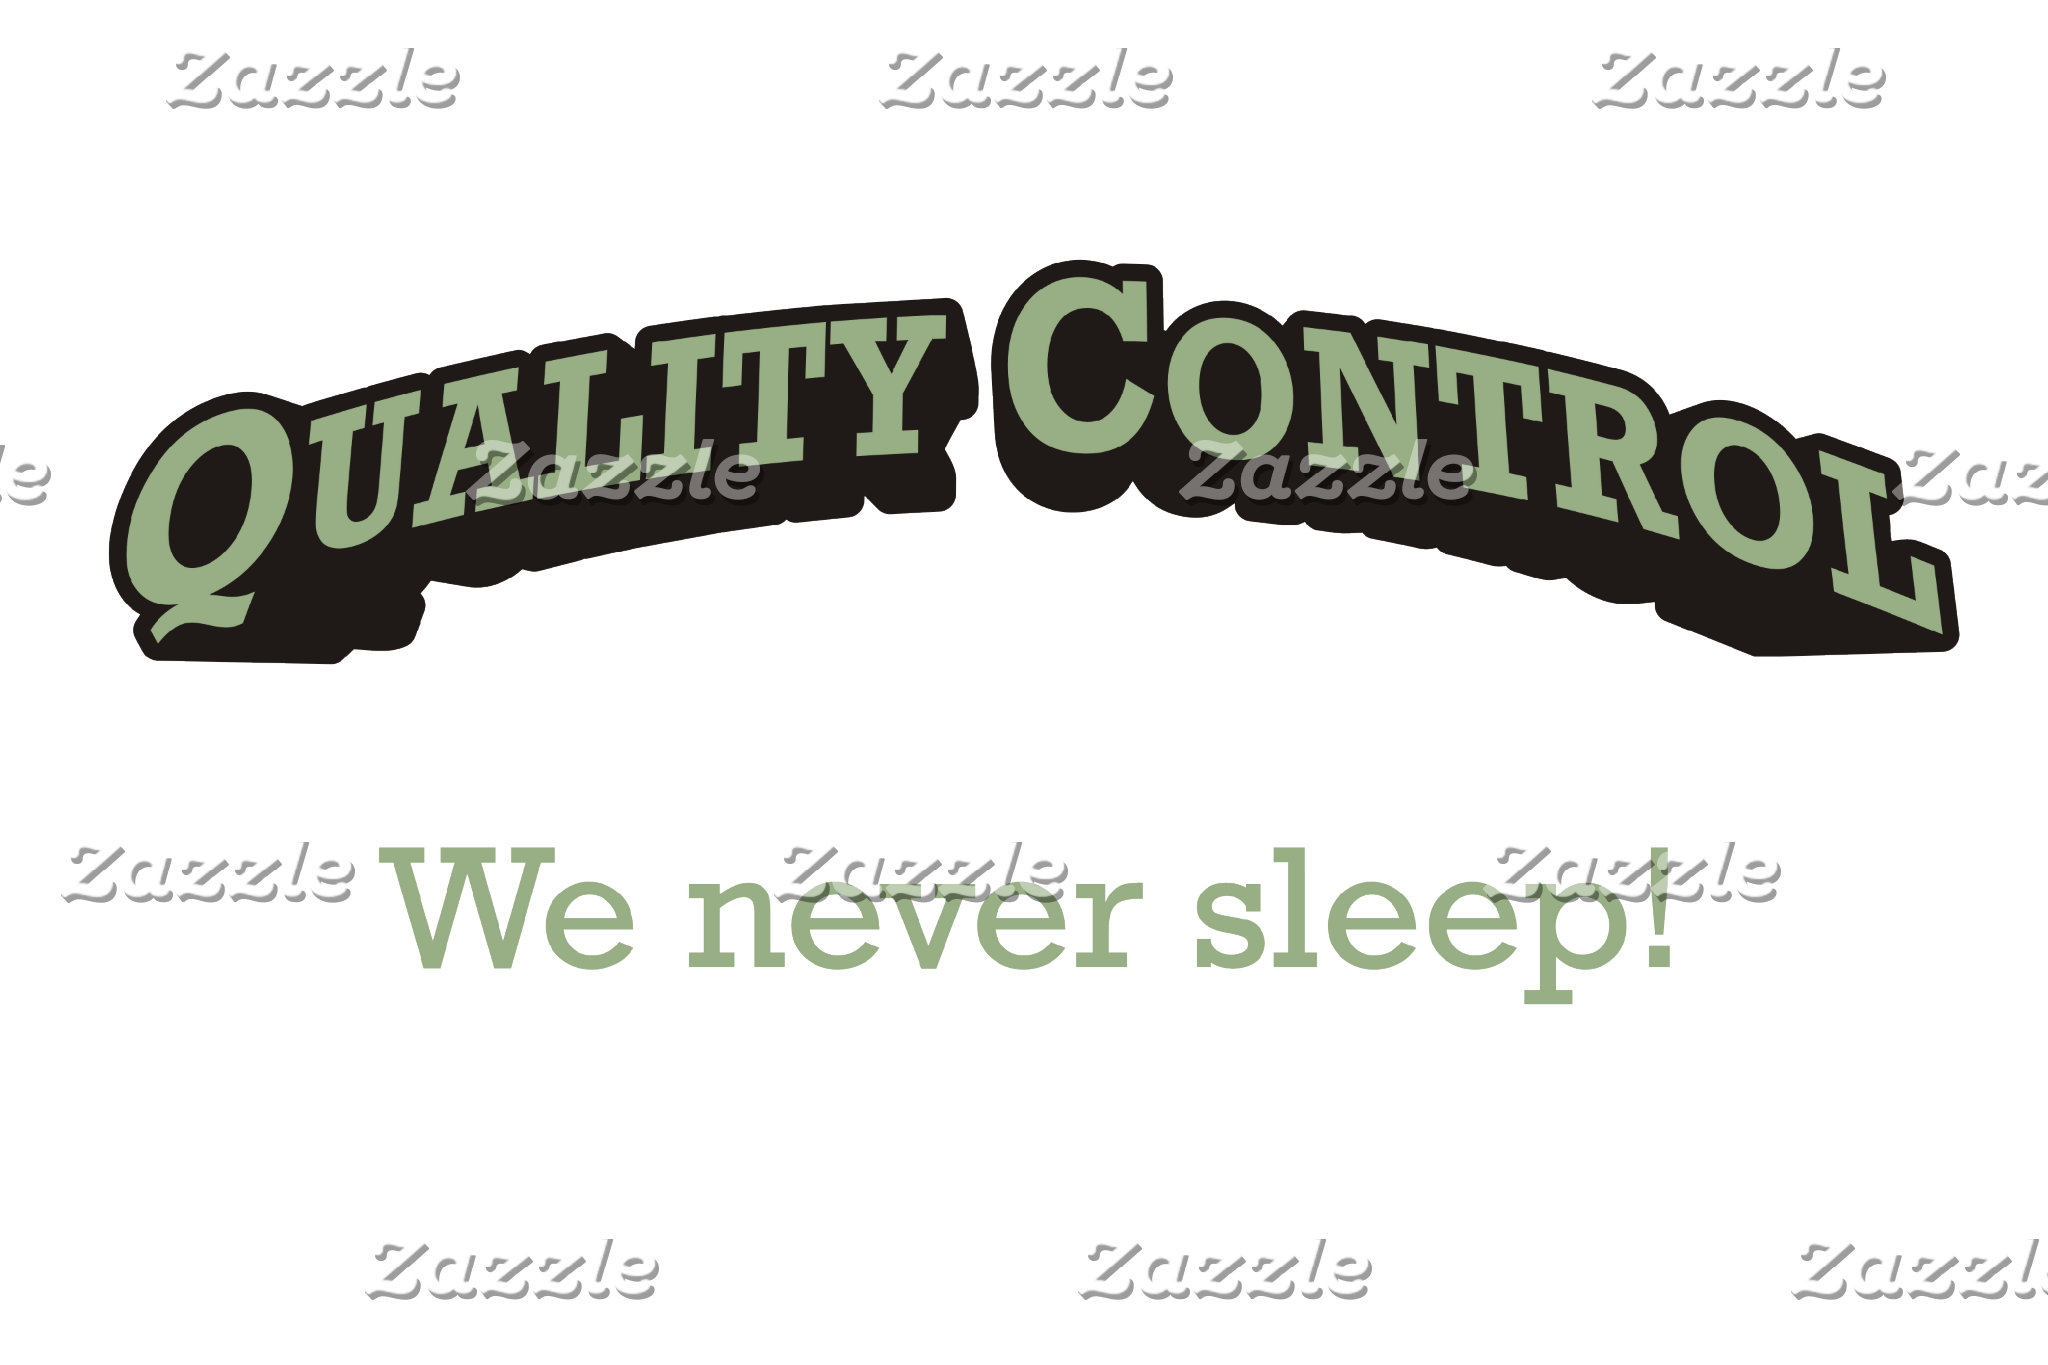 Quality Control / Sleep